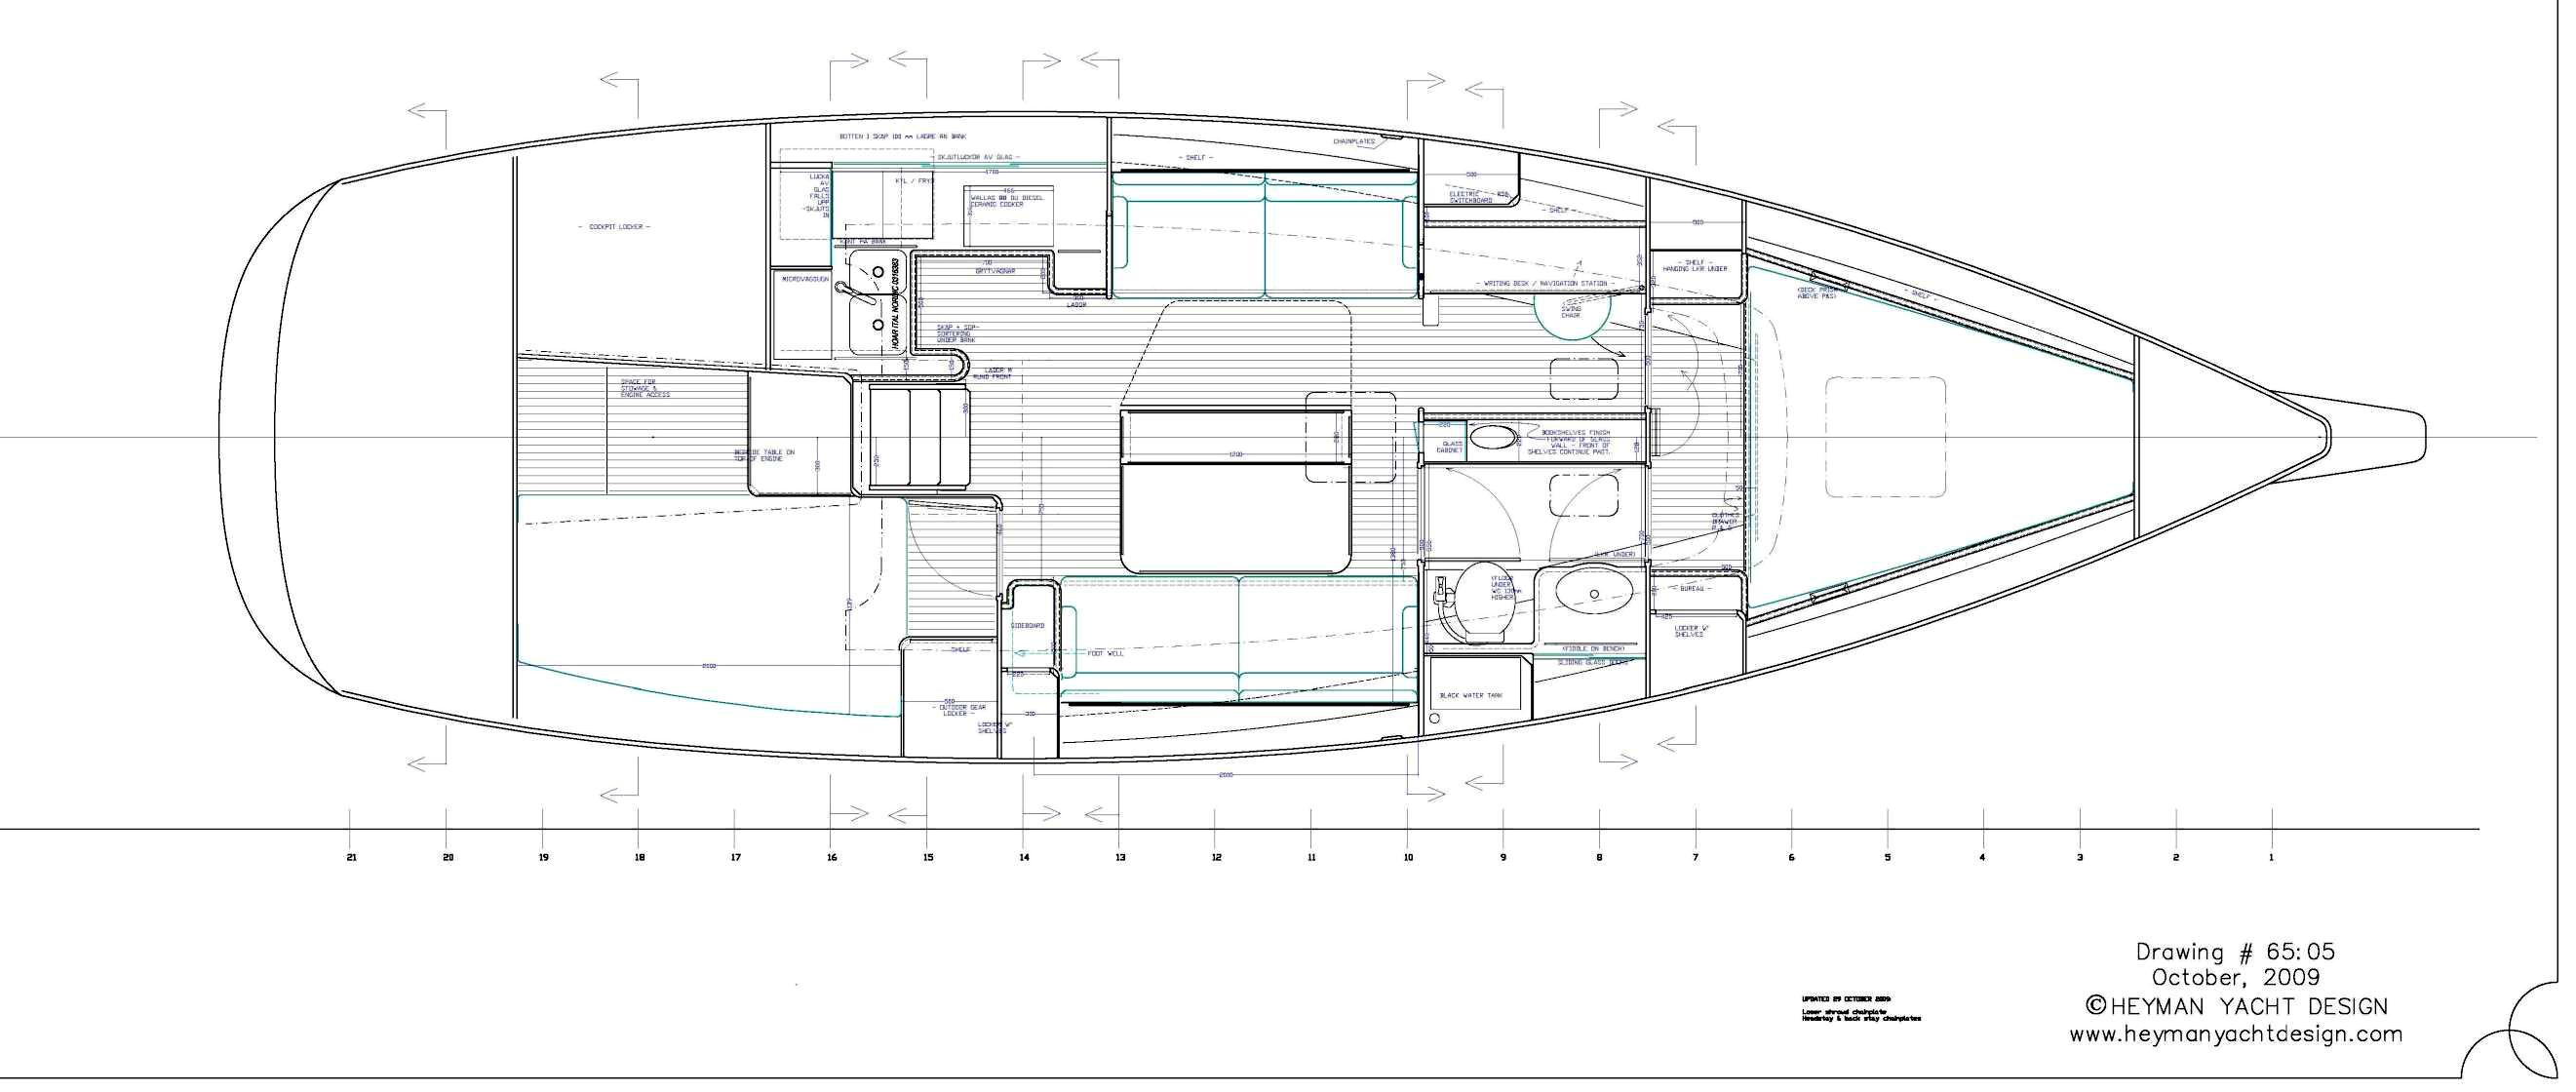 Celeste 36 alternative interior layout